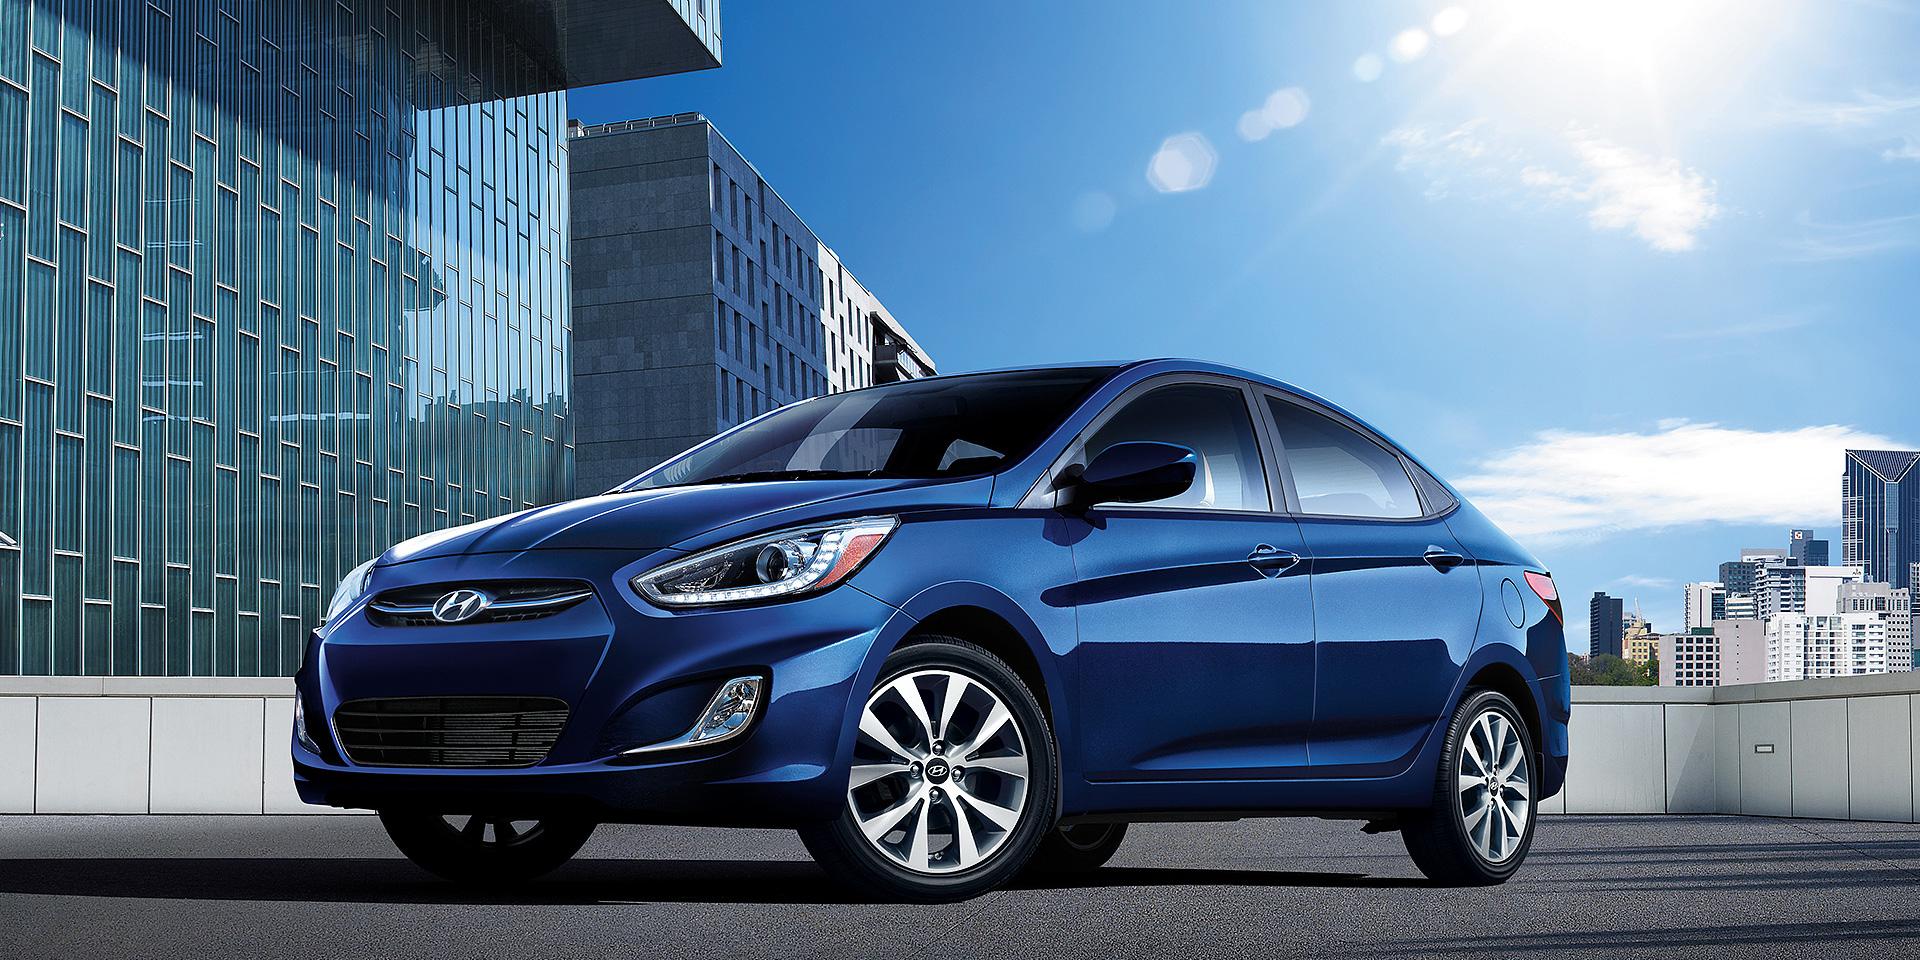 2016 Hyundai Accent Vs Kia Rio 2010 4 Door Sedan Exterior